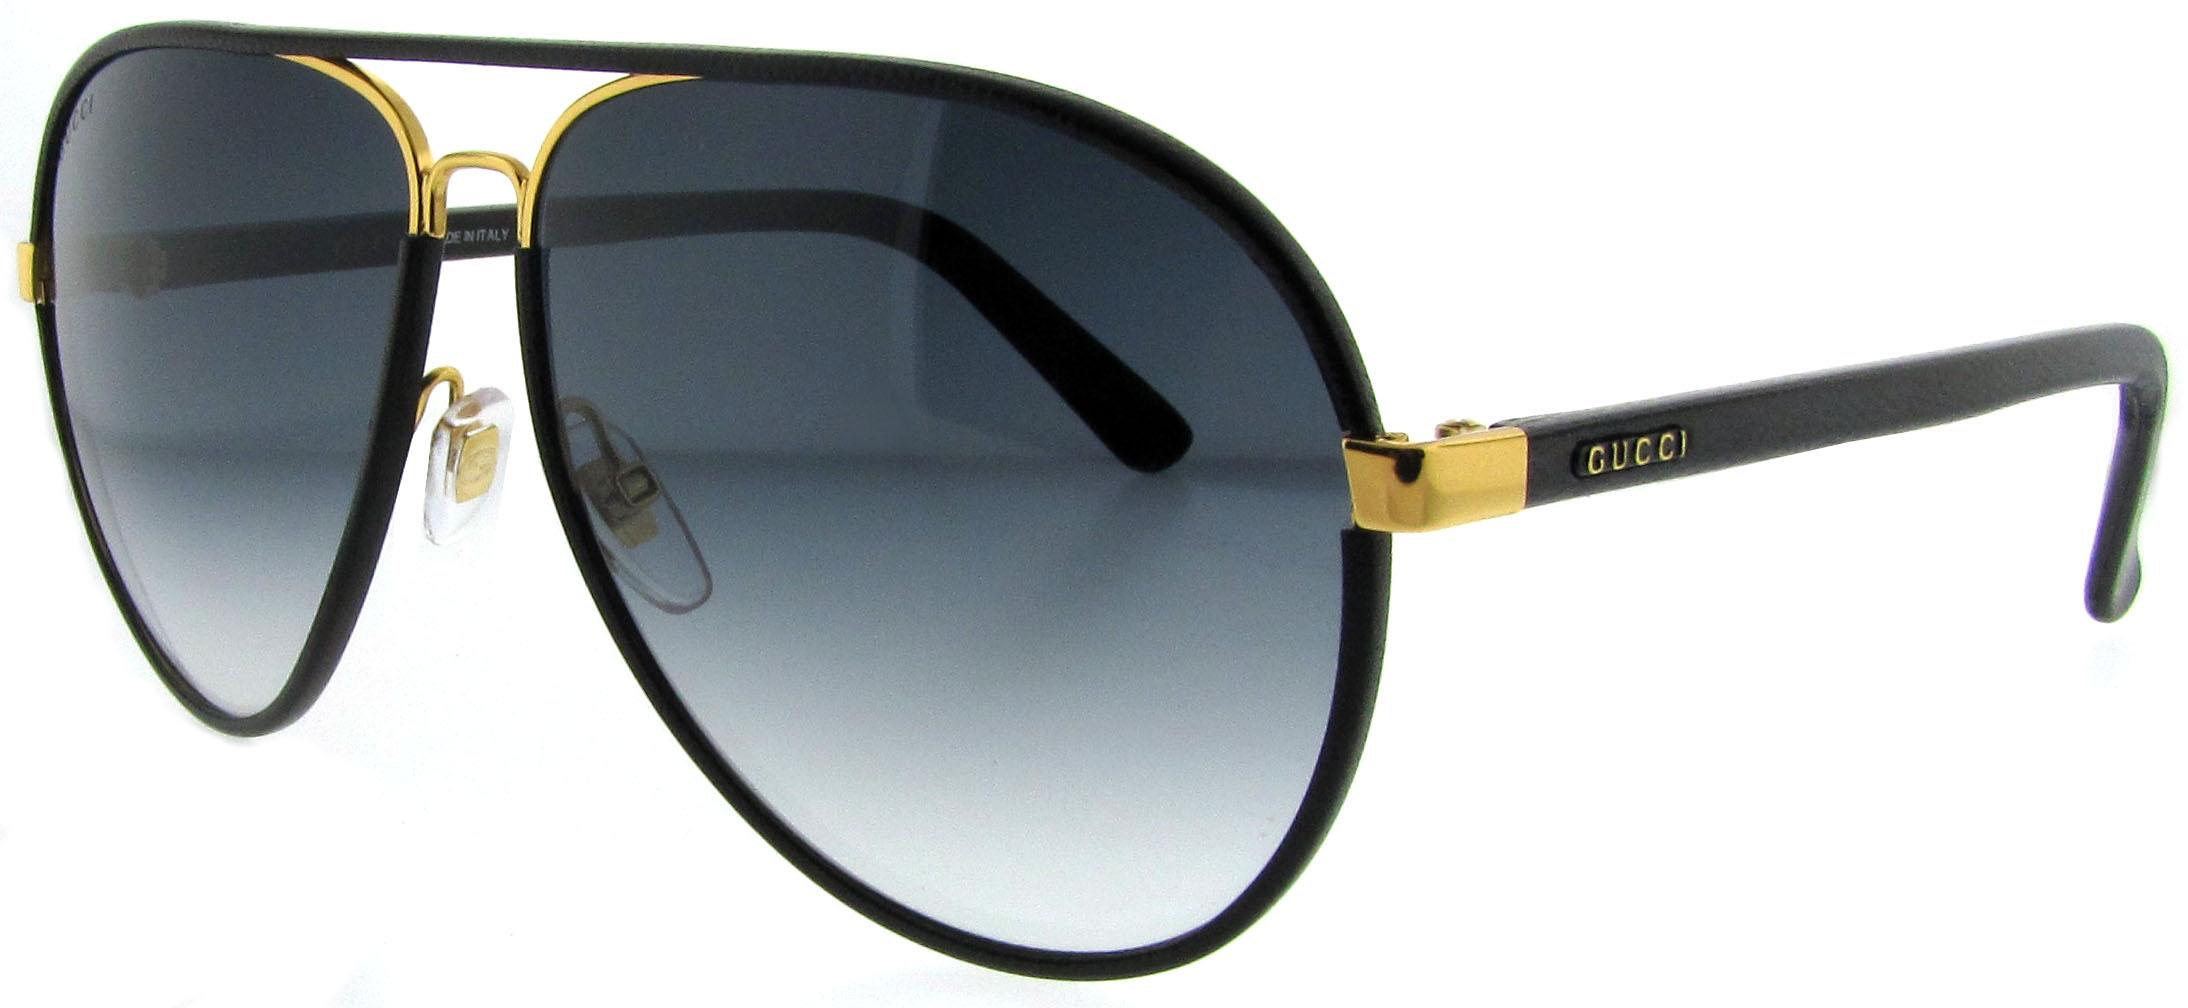 aviator sunglasses polarized  leather aviator